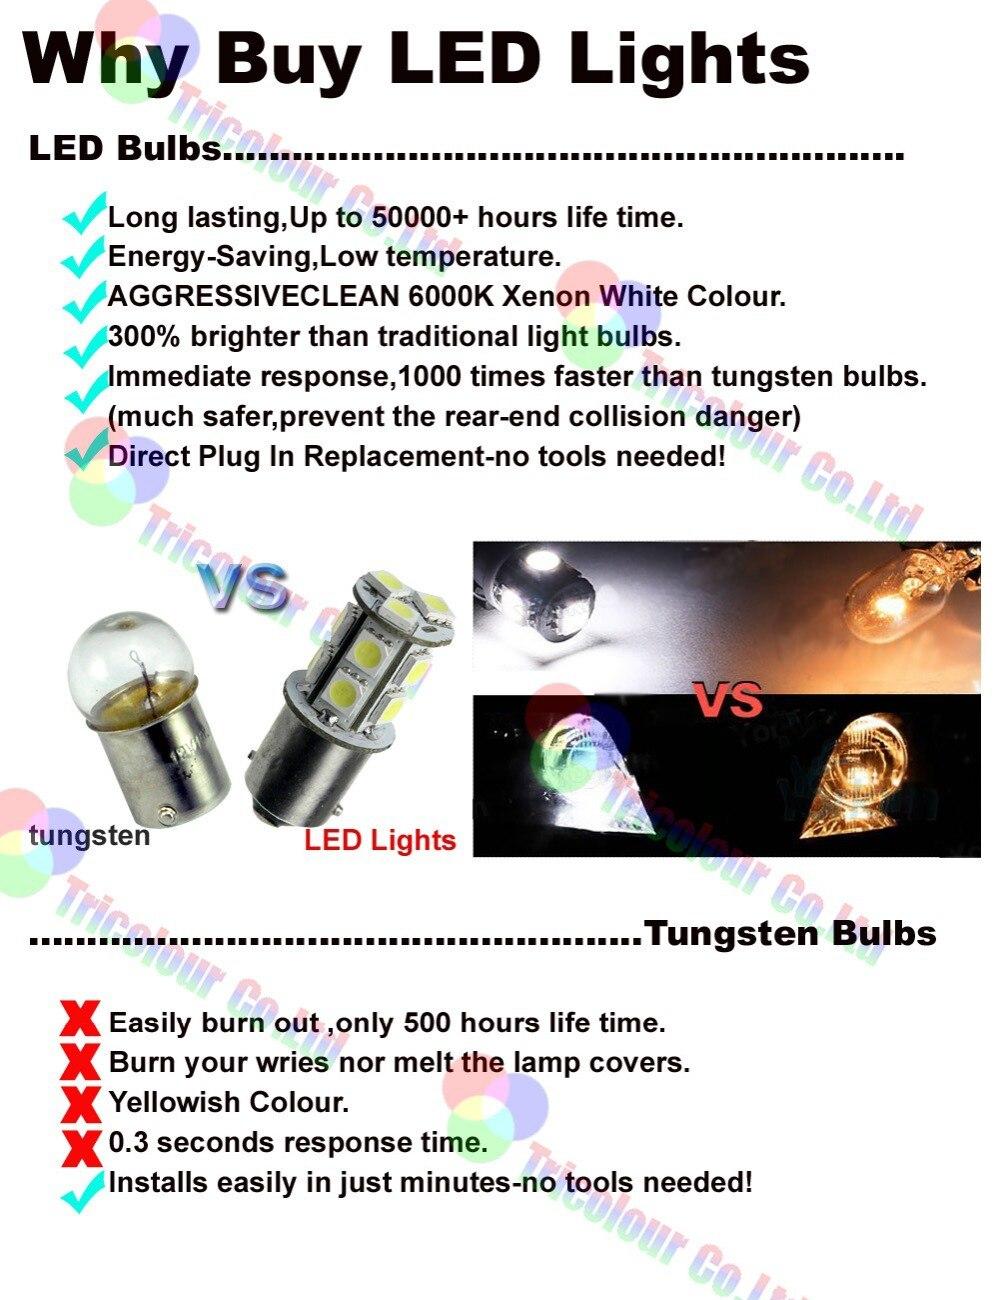 Autoec 50x T10 5 LED без Предупреждение Ошибка Canbus W5W 194 5050 SMD Бесплатная авто клина автомобиля 5LED свет зазор лампы 5smd DC 12 В # lb95